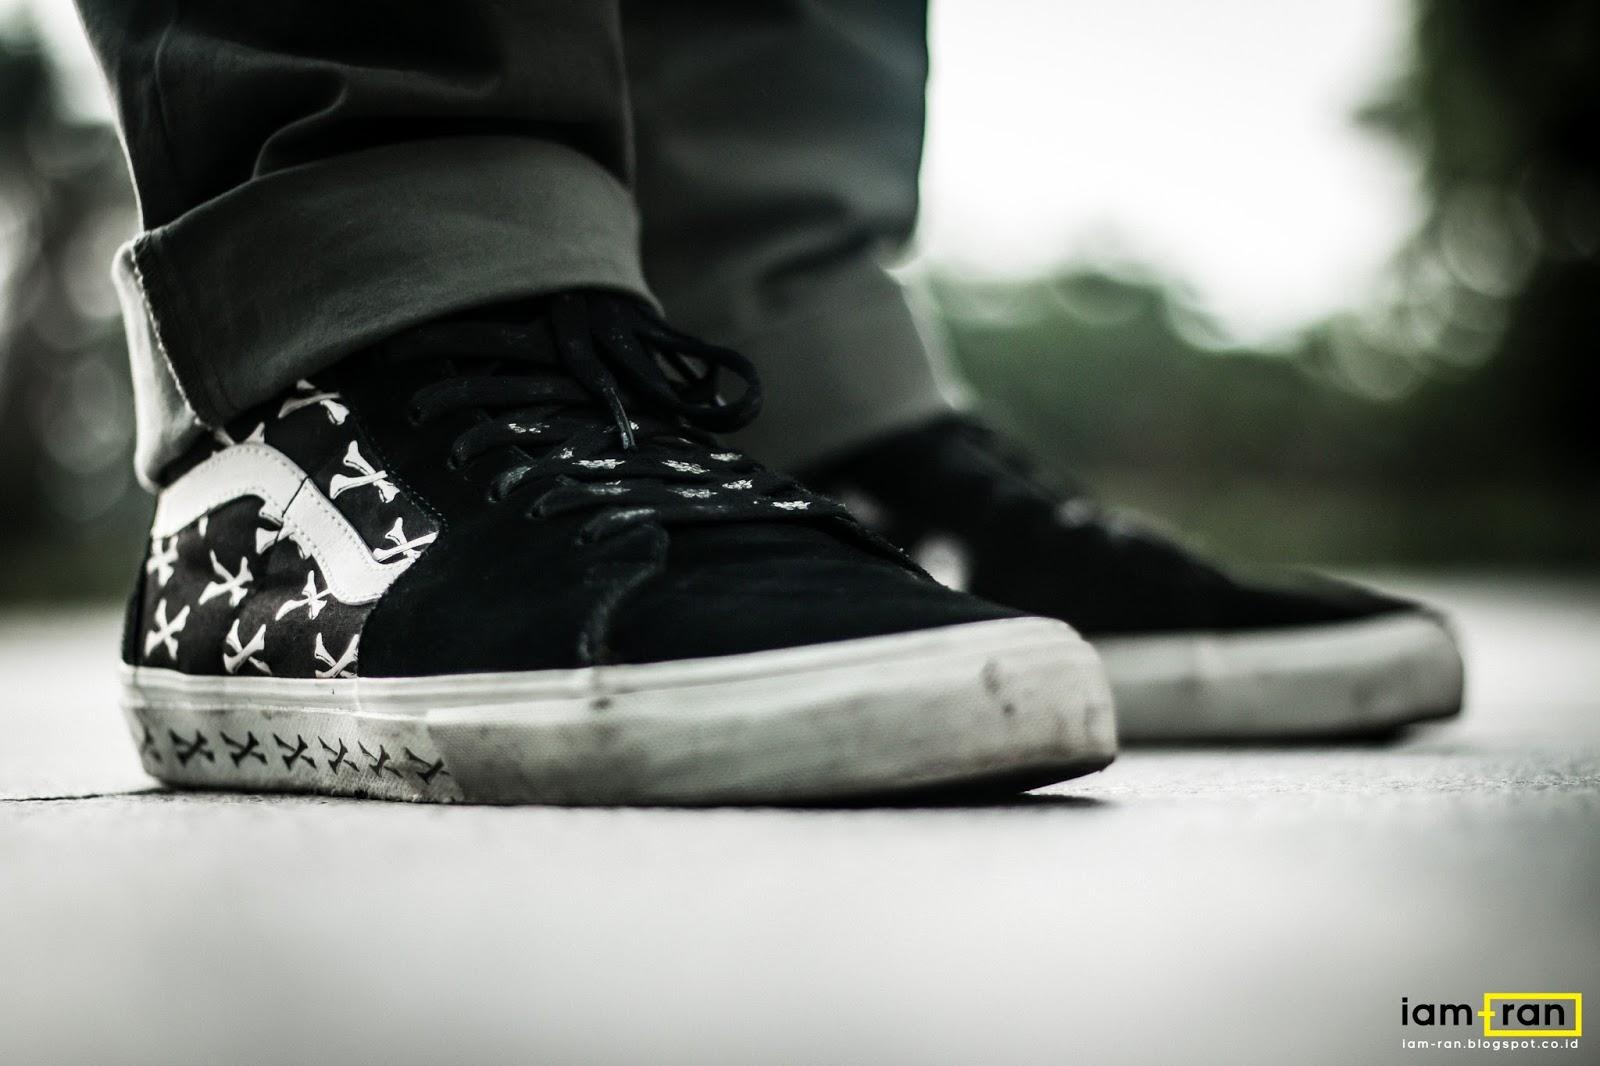 b20ab1cdfc4681 Arfan Okky on feet   Sneakers   Vans SK8 hi x Syndicate x Wtaps 003